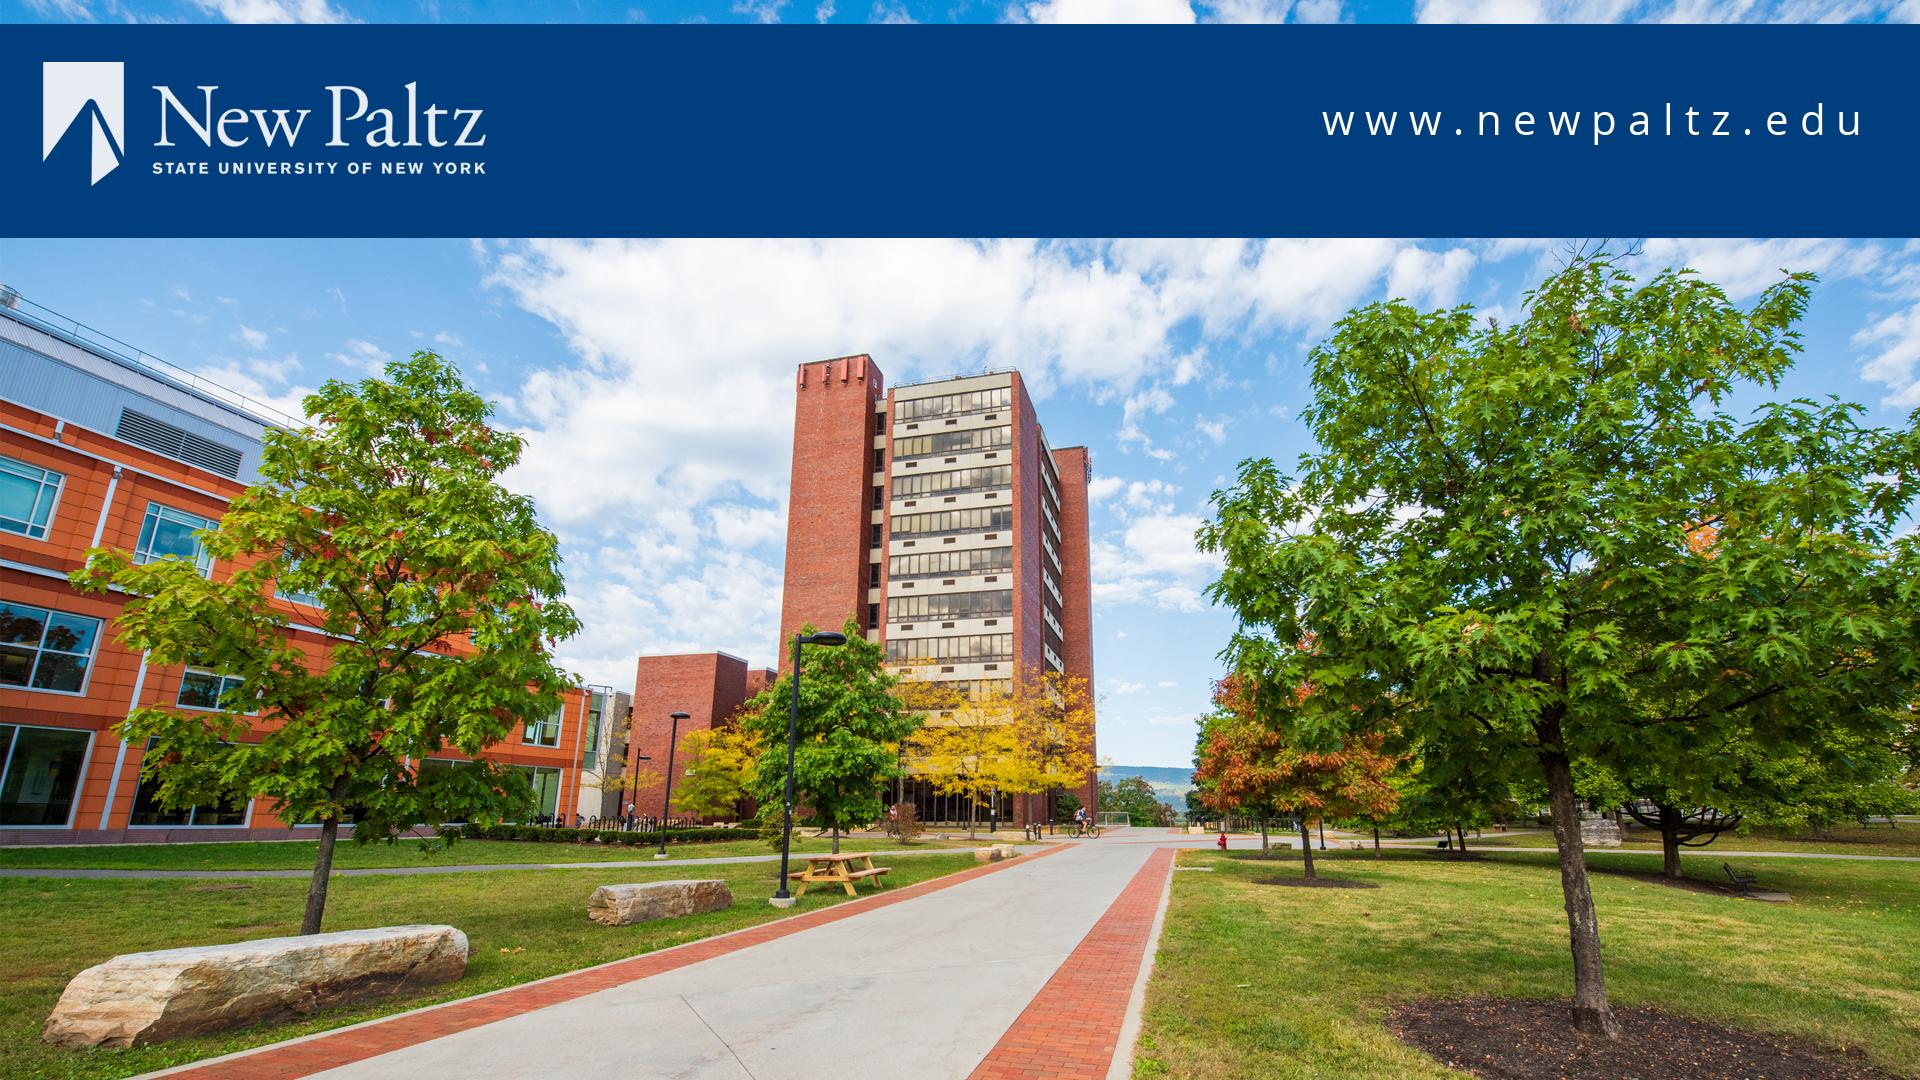 Suny New Paltz Academic Calendar Spring 2022.Suny New Paltz Office Of Communication Marketing